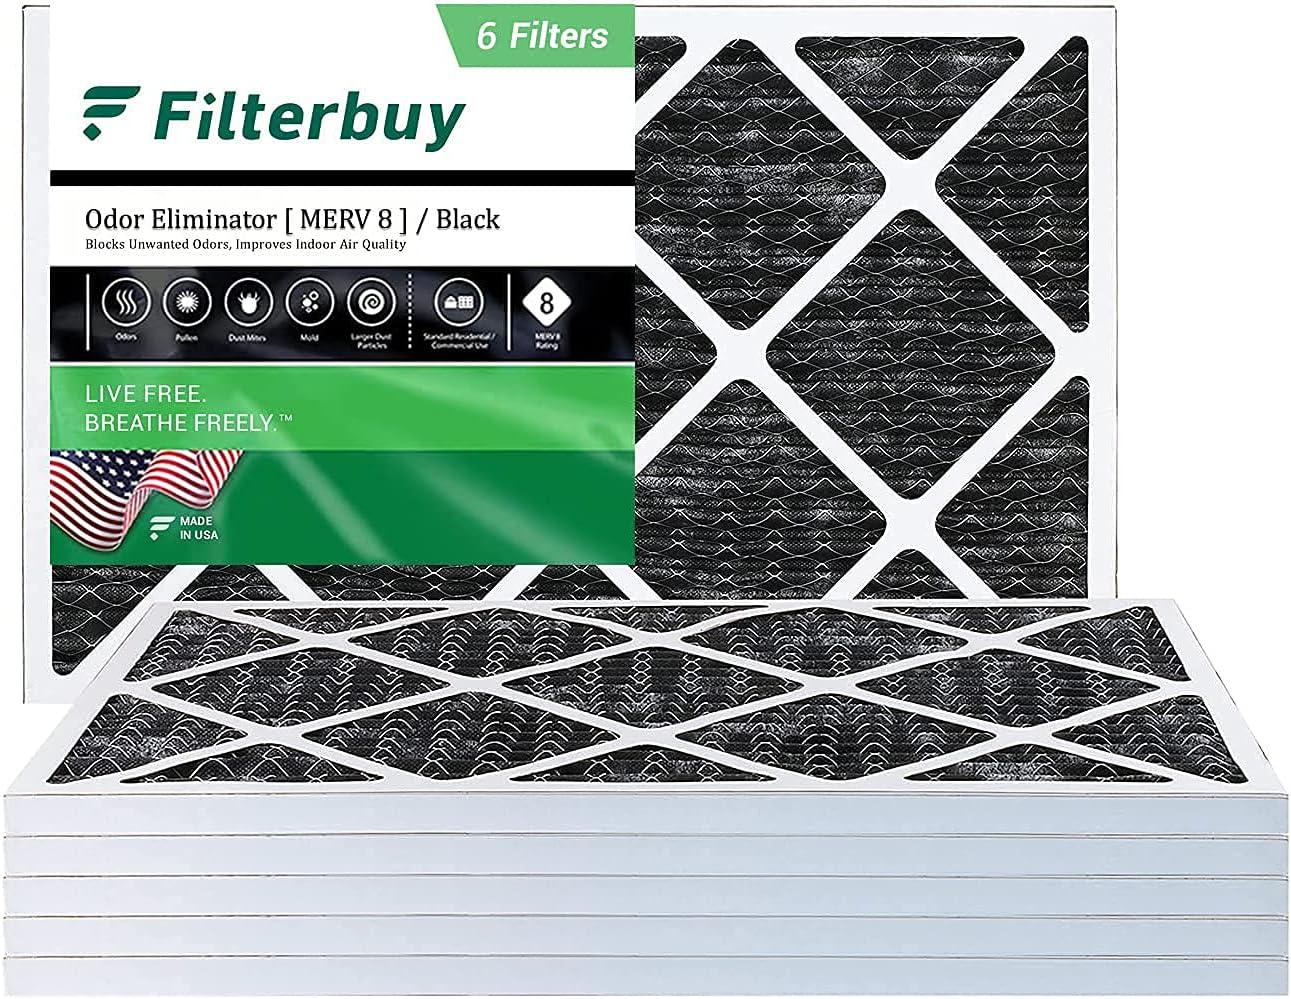 FilterBuy 14x25x1 National uniform free shipping Air Filter MERV Allergen Deluxe 8 Odor Eliminator